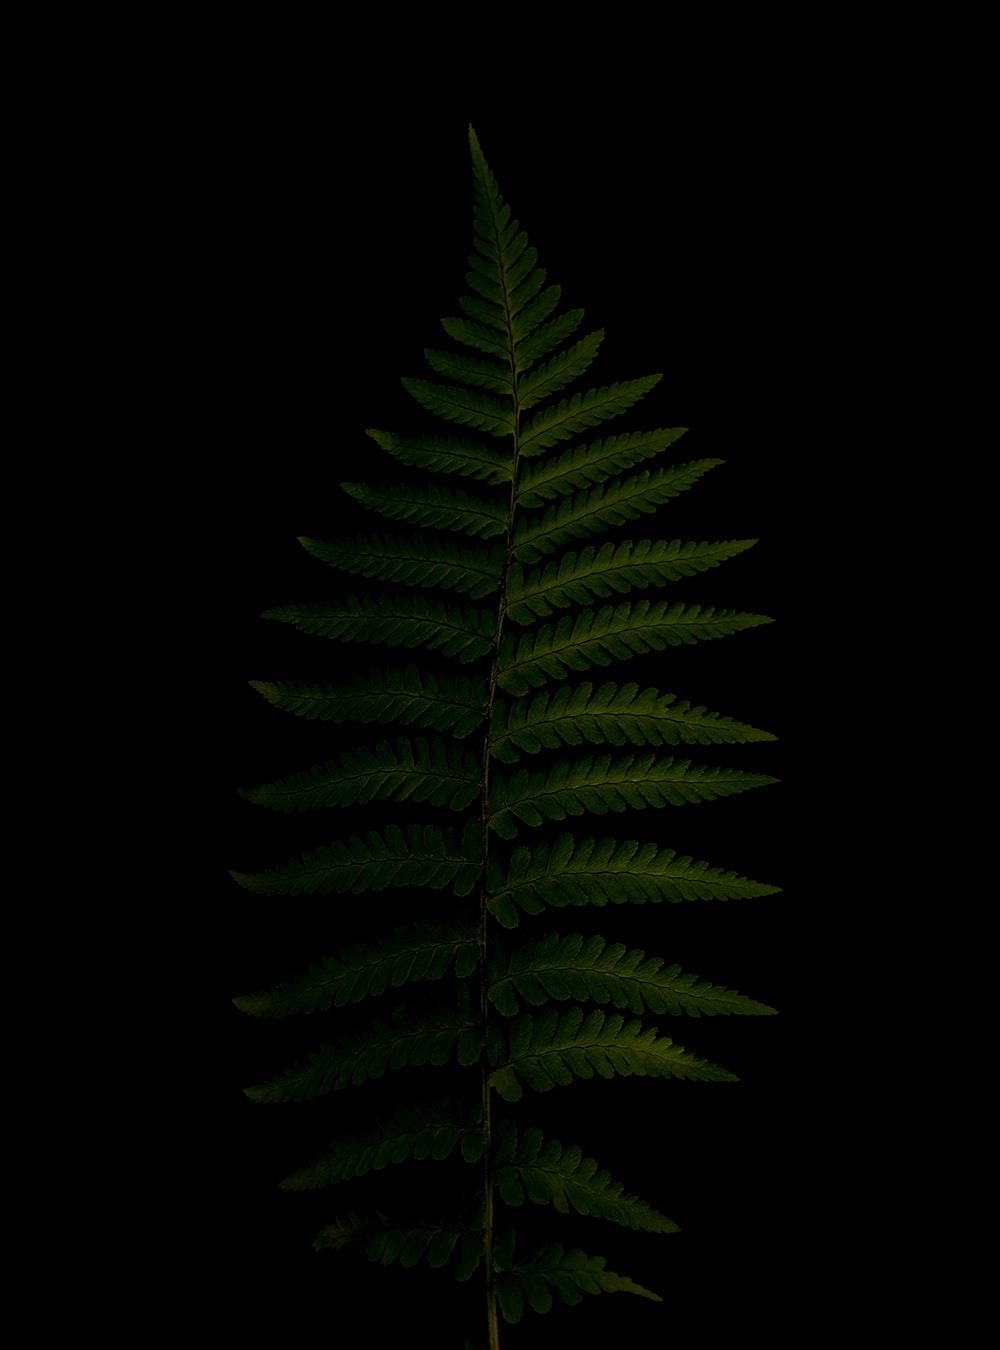 green fern plant in black background